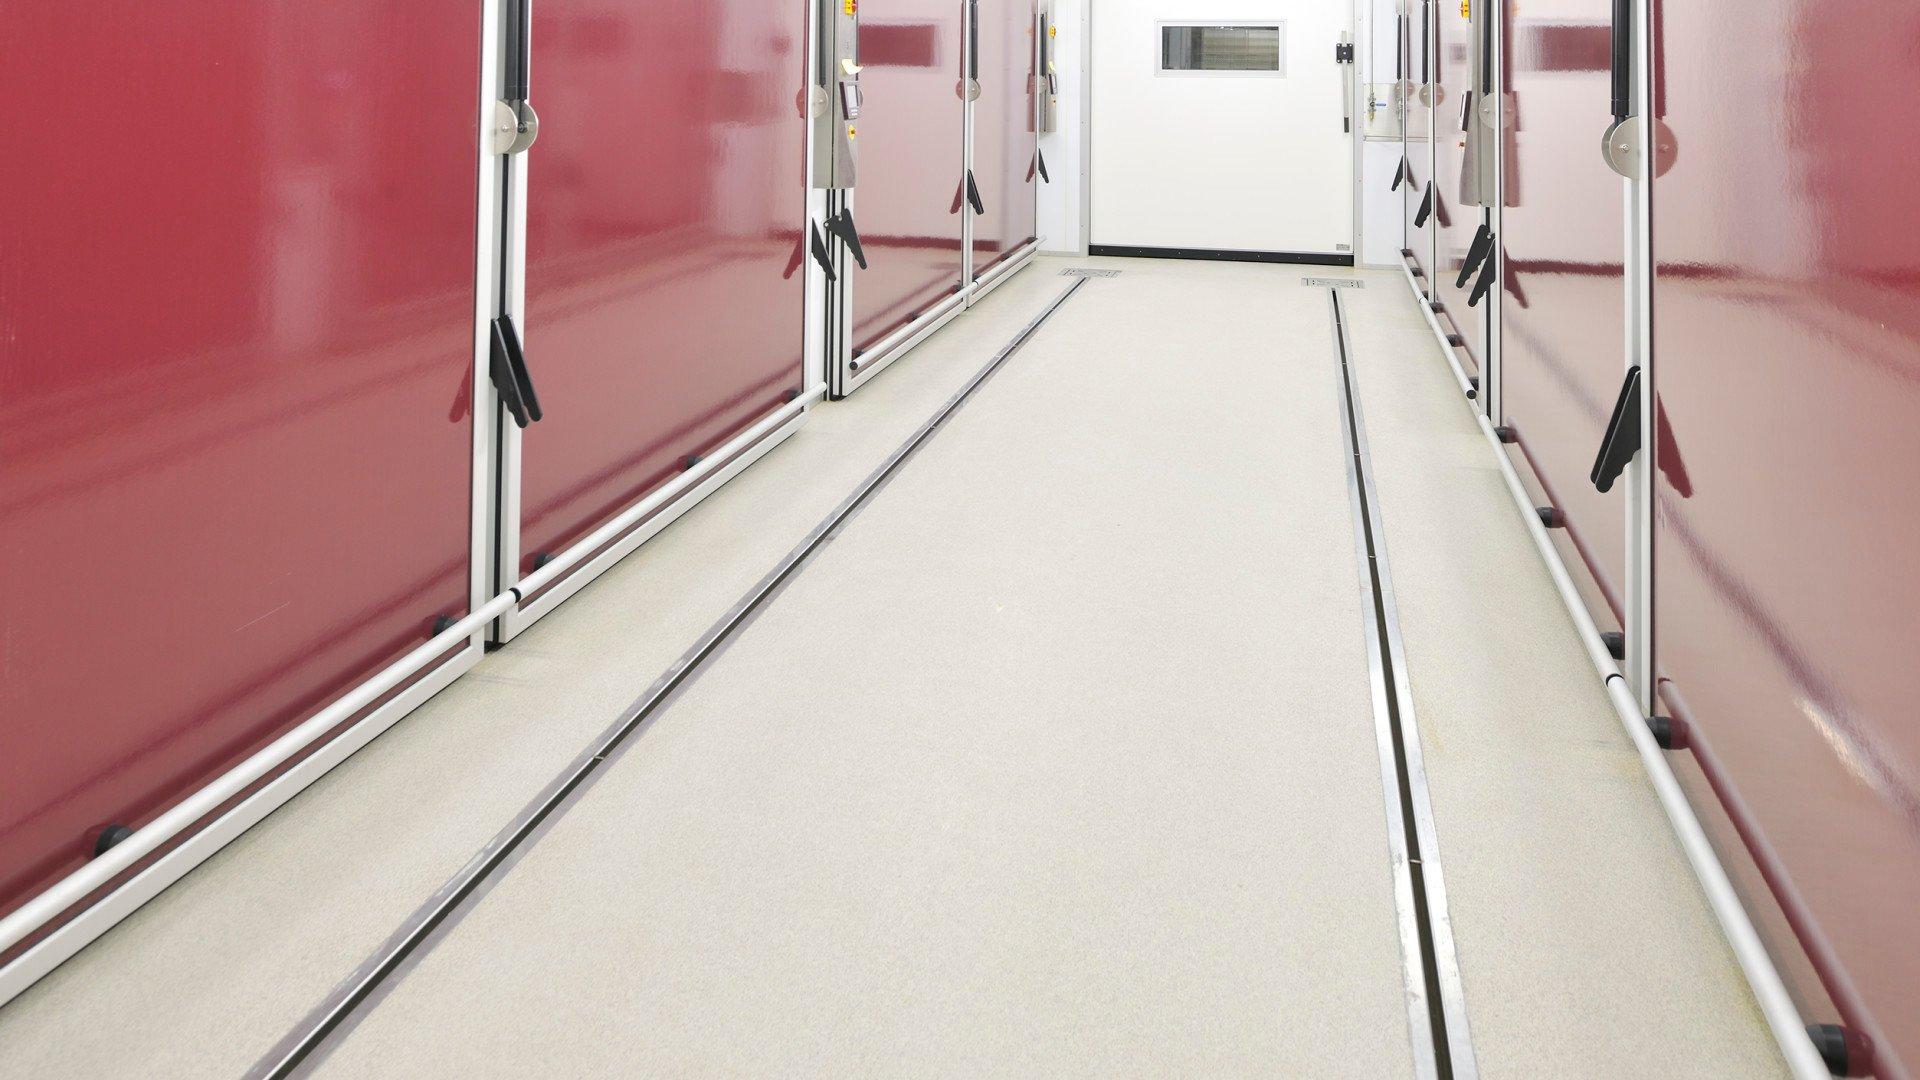 poultry flooring - Pluriton Broederij Afferden Bolidtop 700